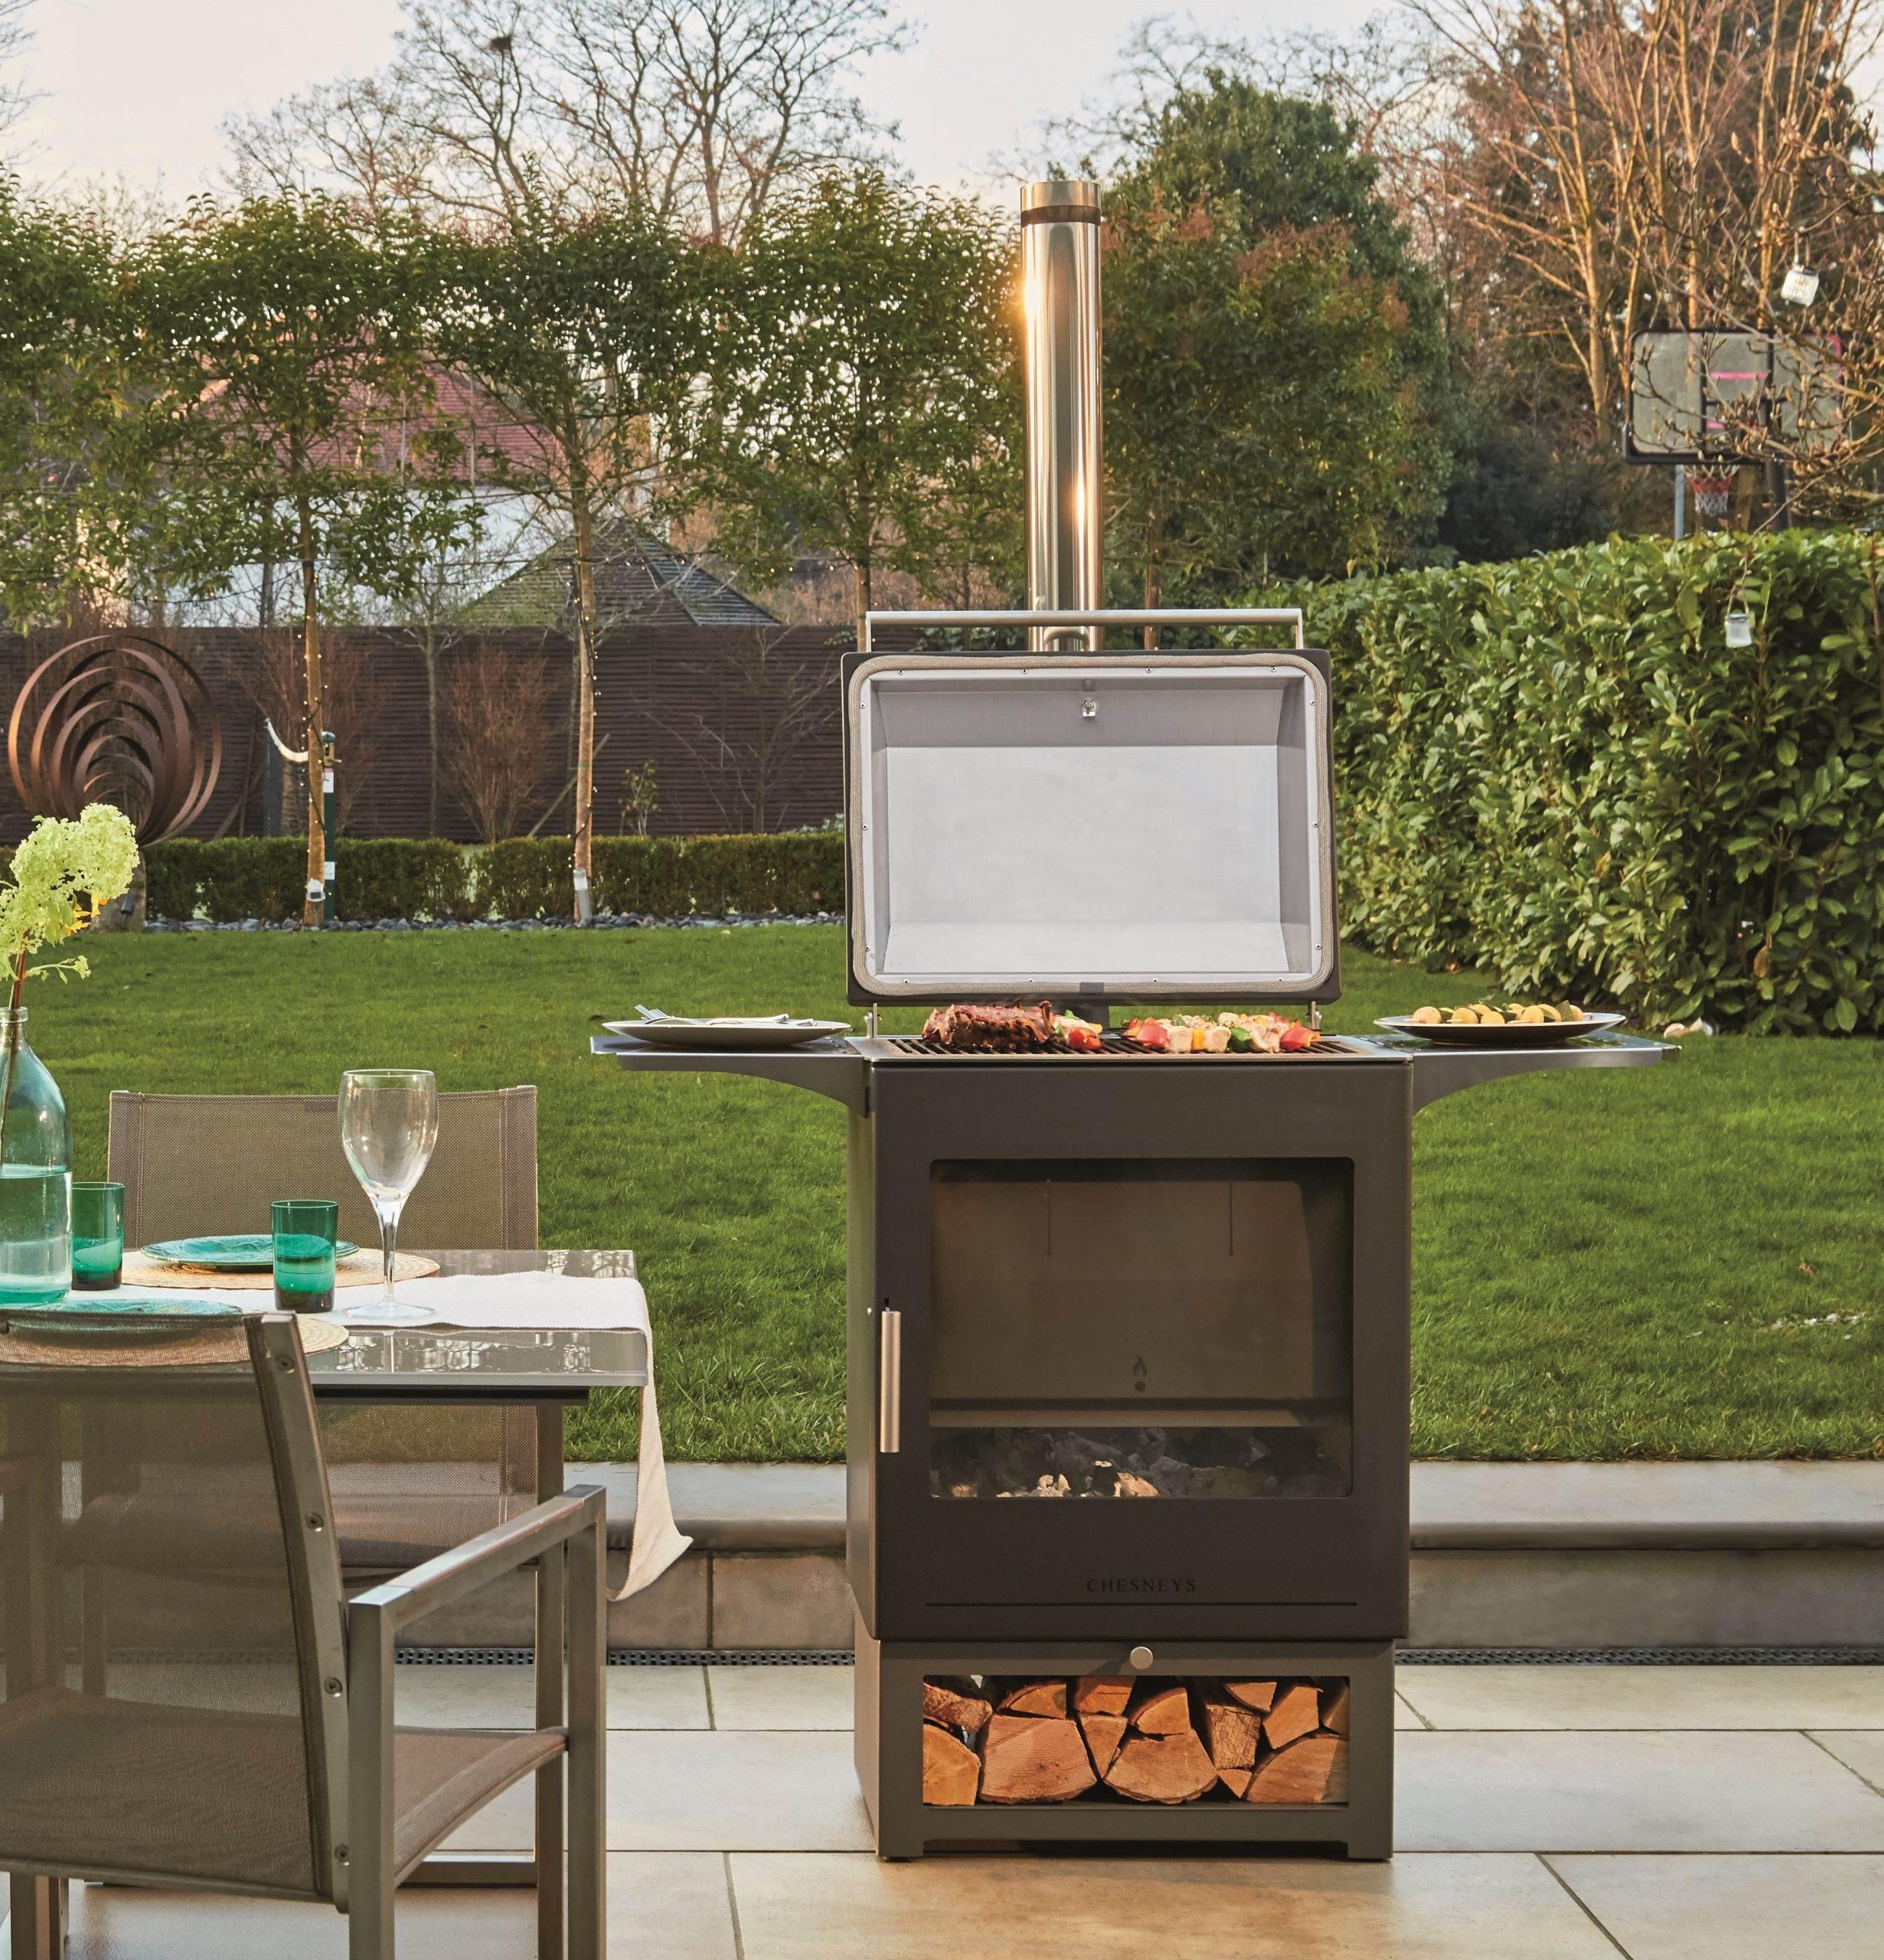 Chesneys Heat & Grill - Patio Heater & BBQ